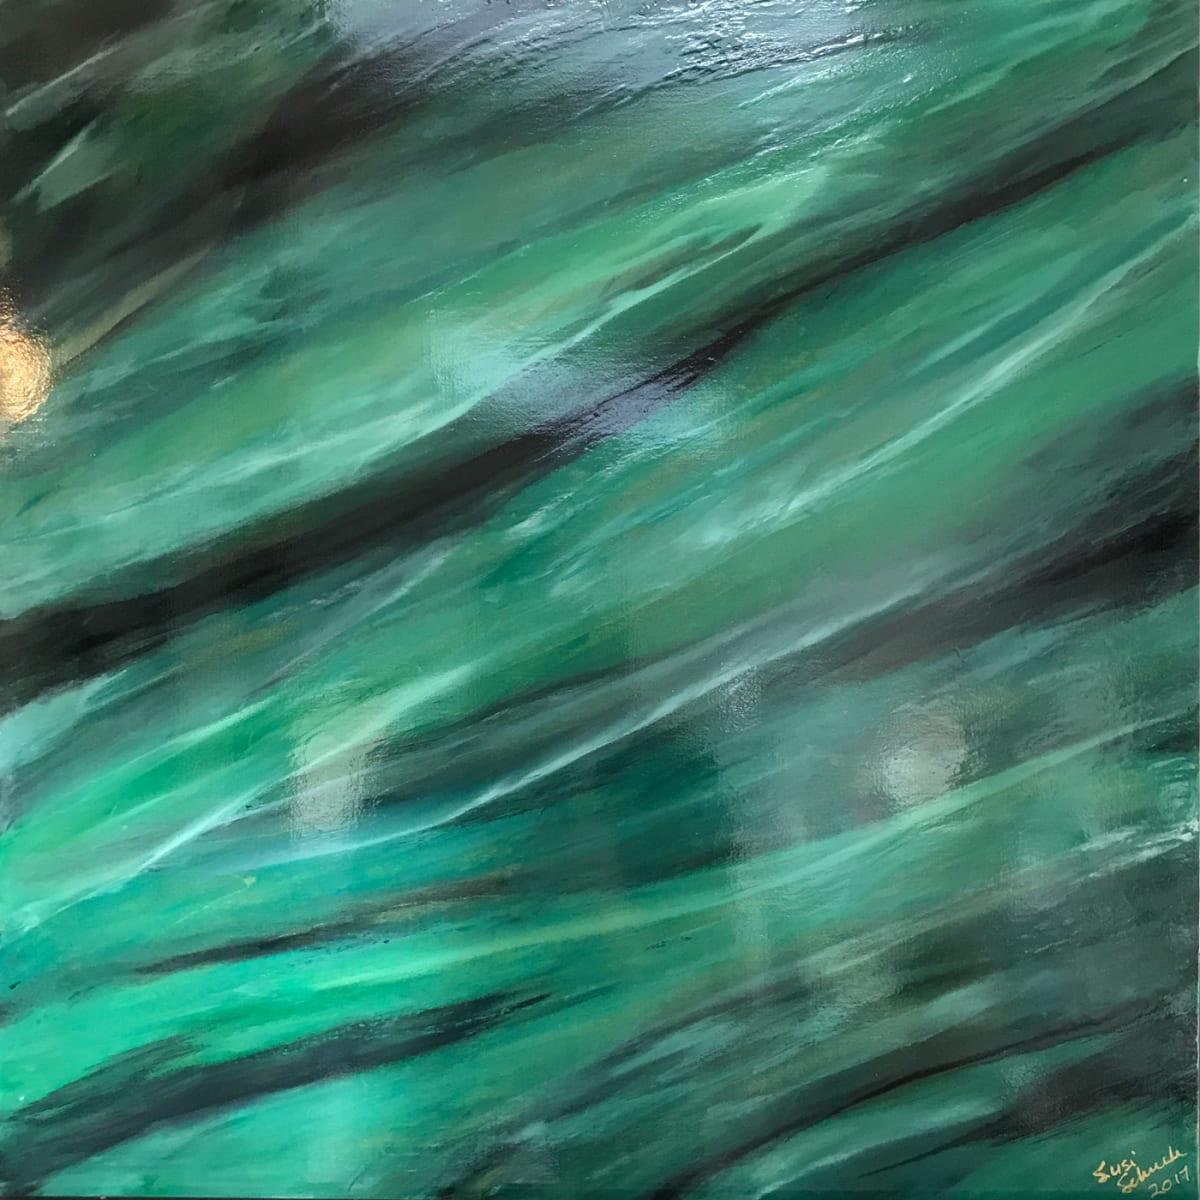 Malachite by Susi Schuele